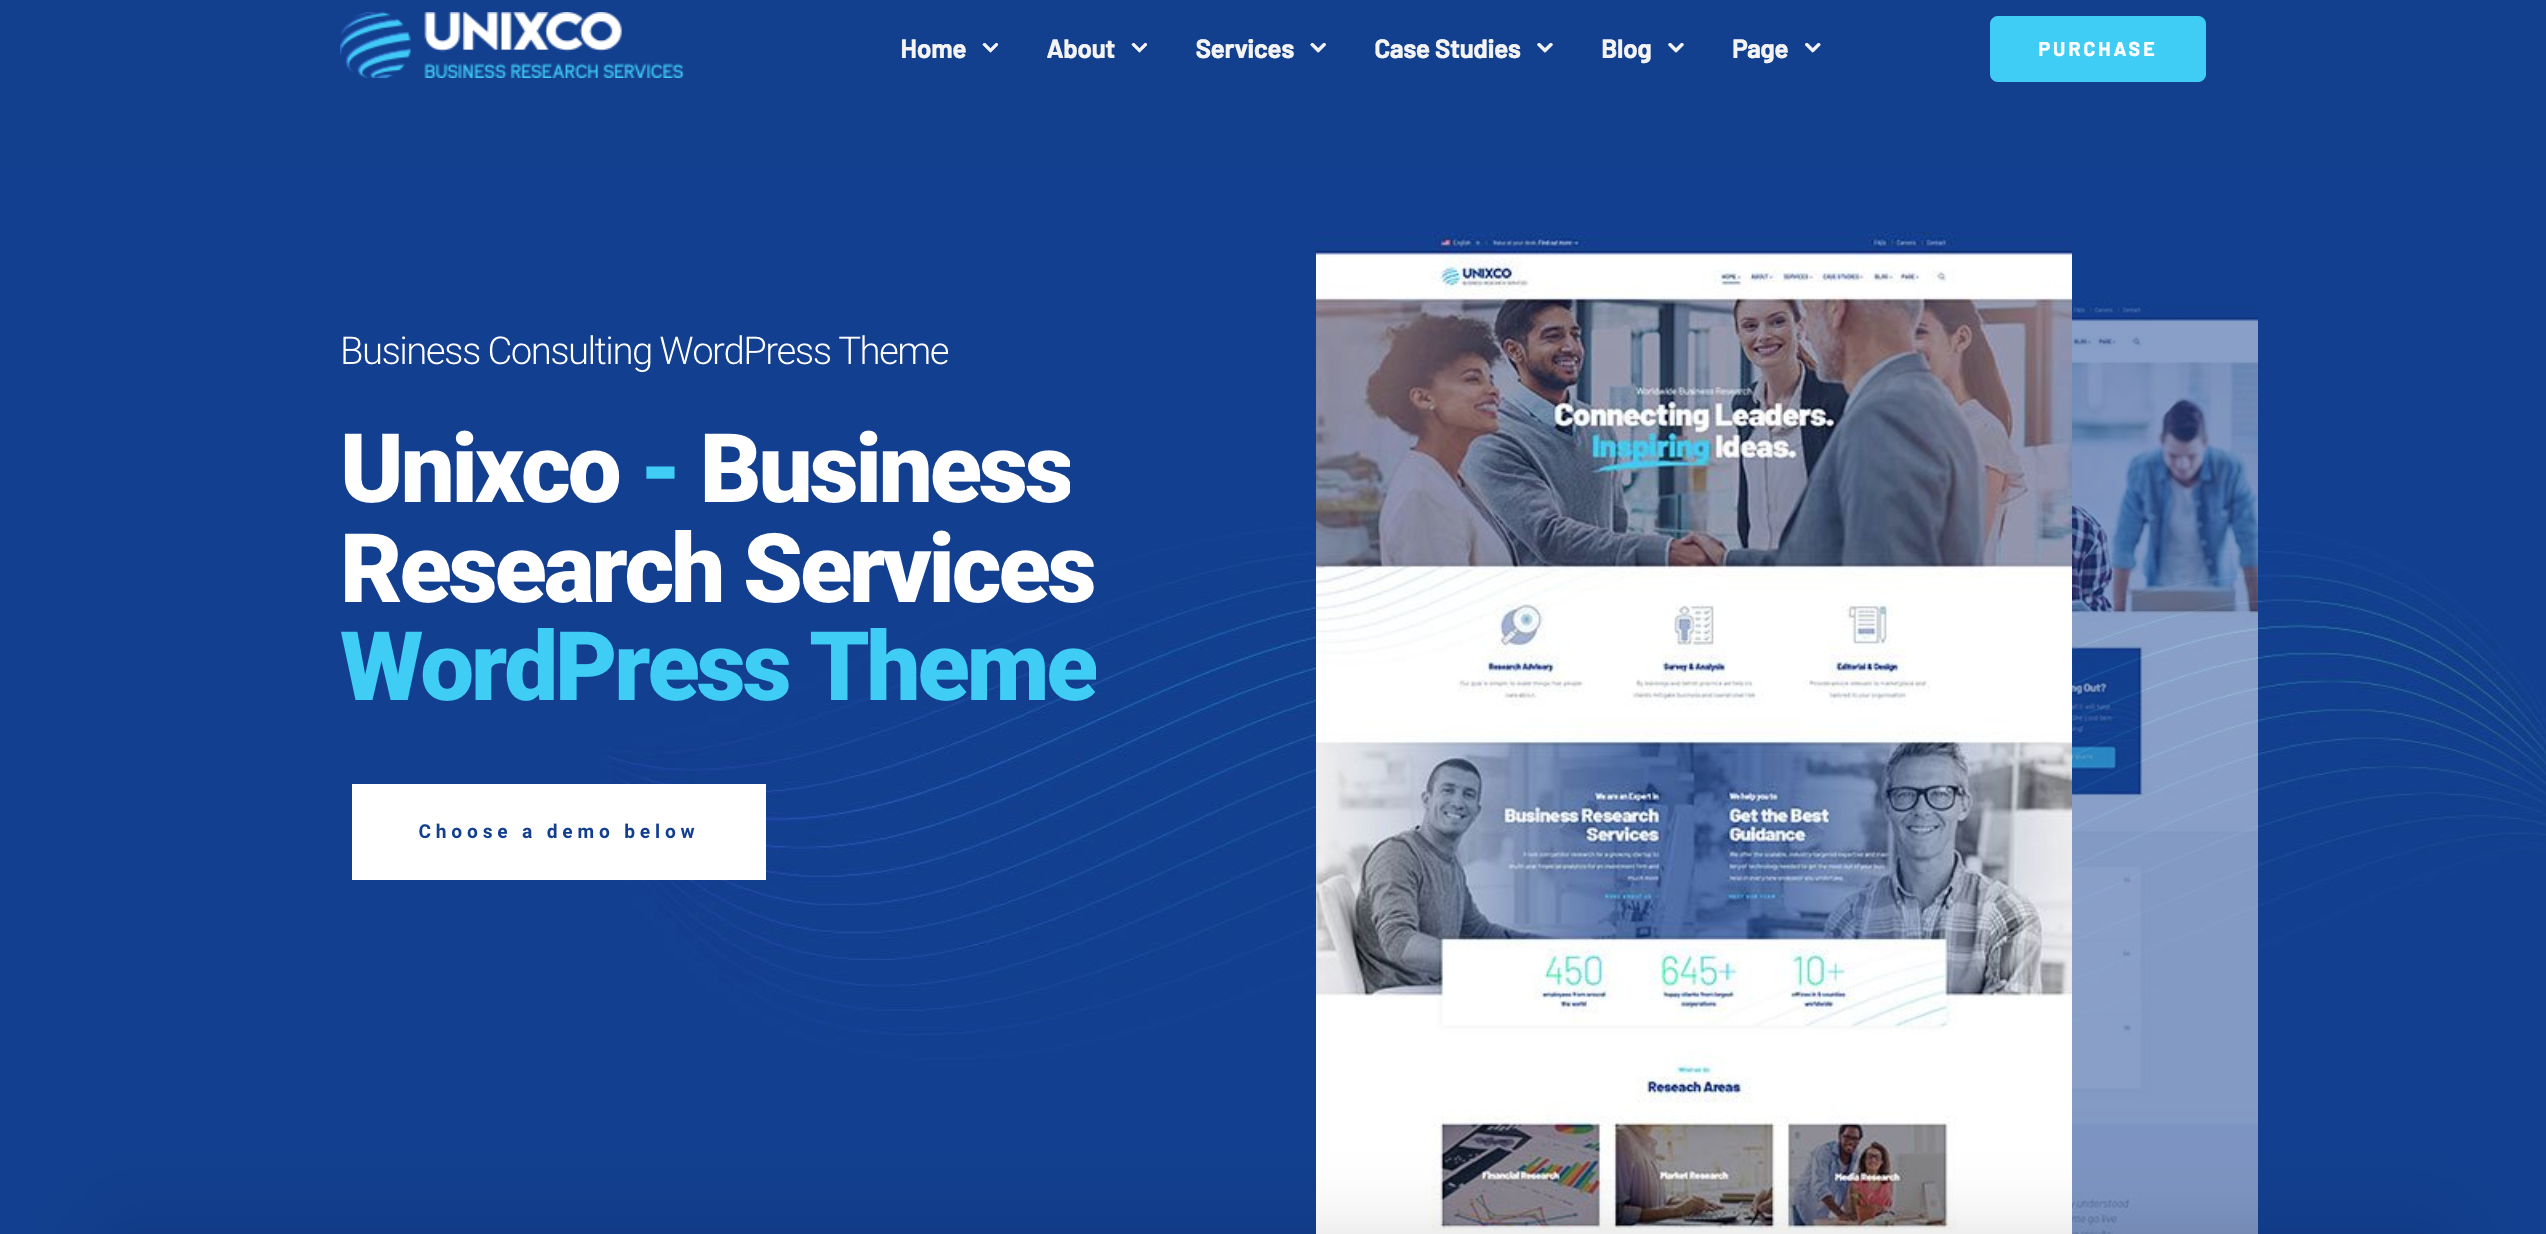 Unixco - Business Research Services WordPress Theme